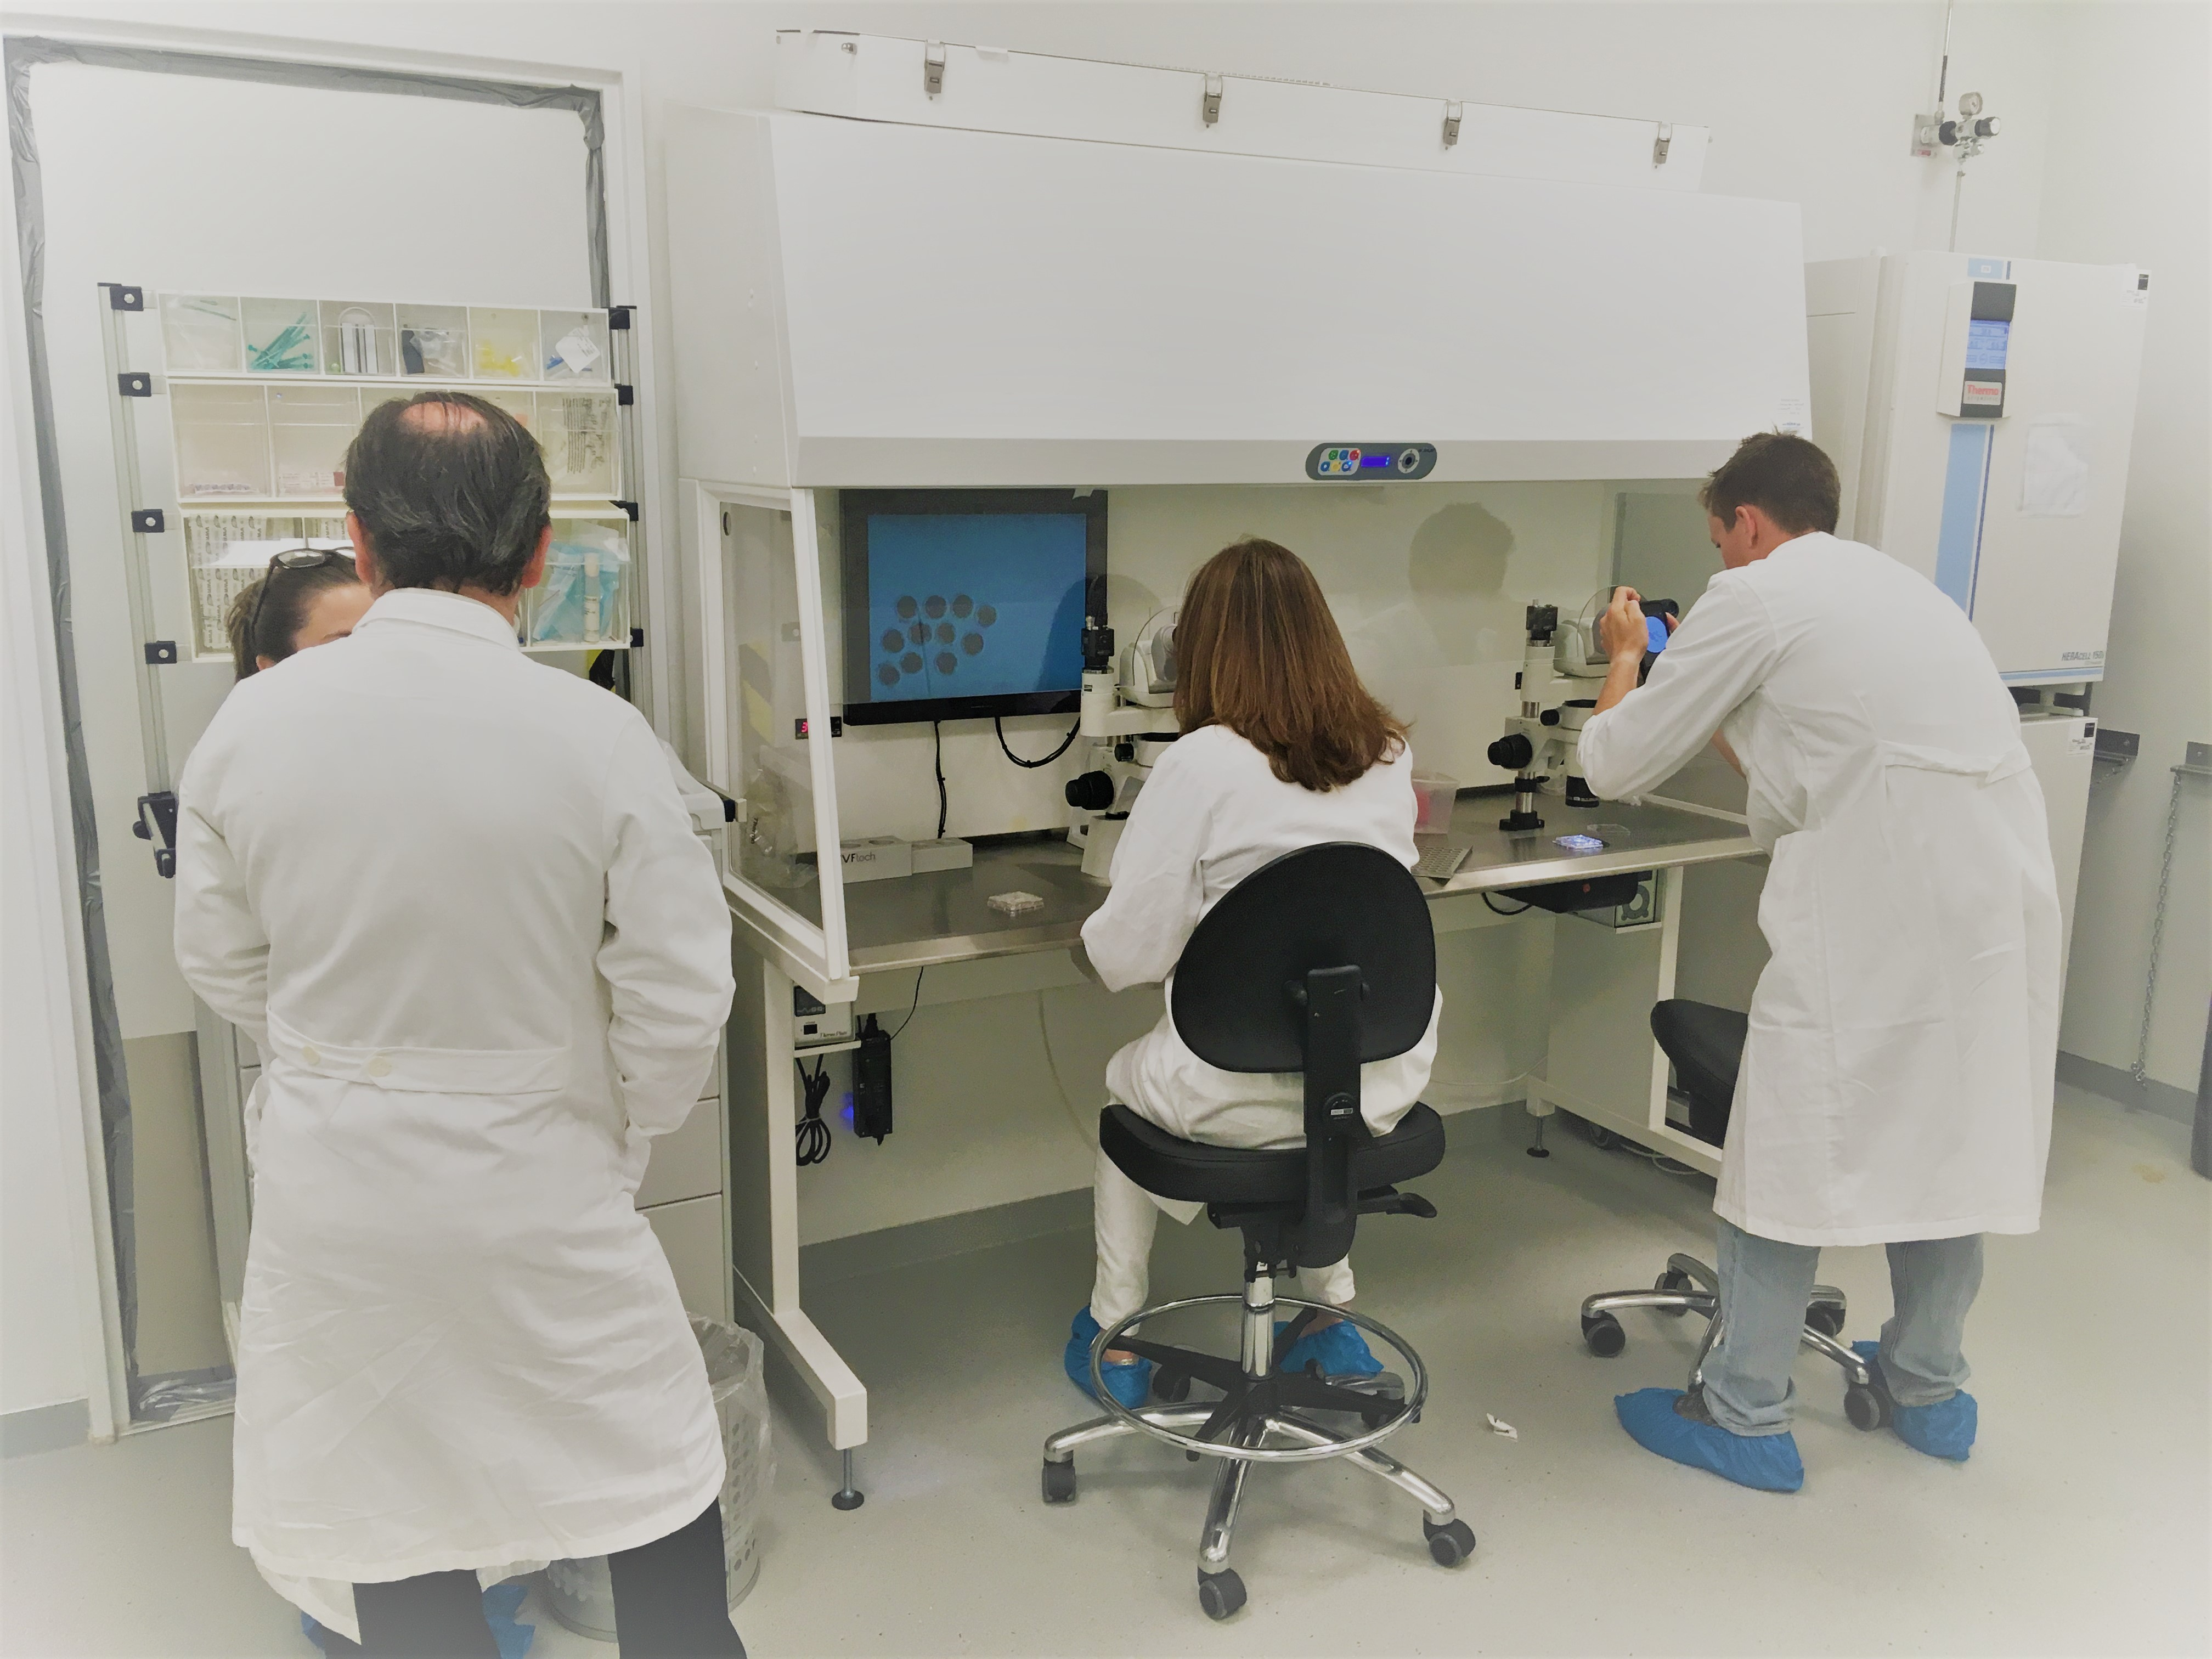 Independent labwork